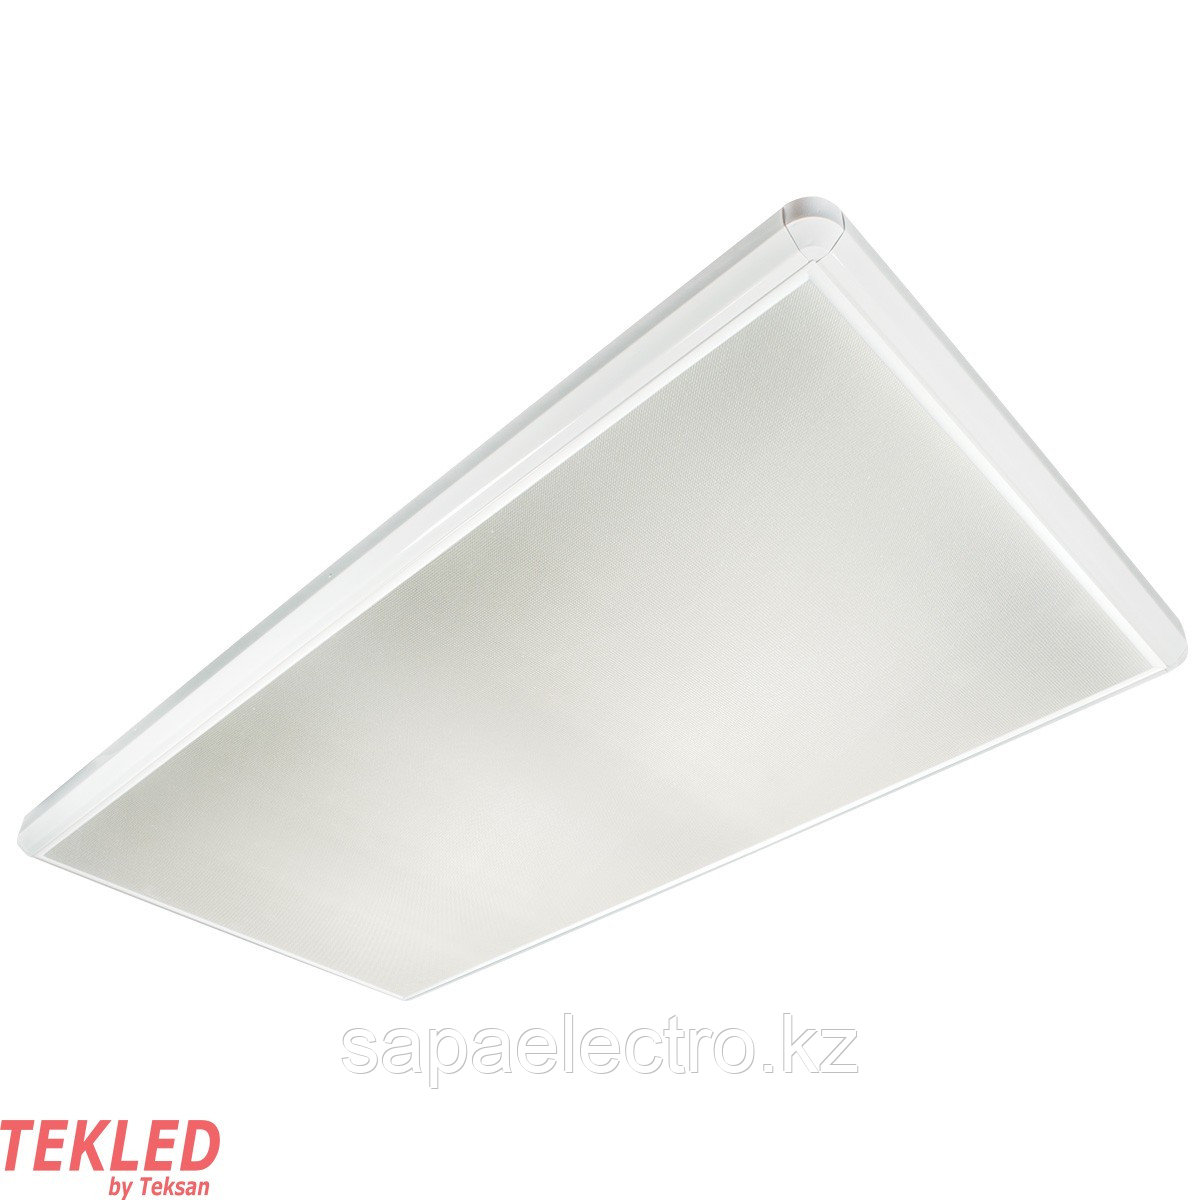 Св-к PINSPOTLED 20X9W/LZN 436 накл-й MEGALUX